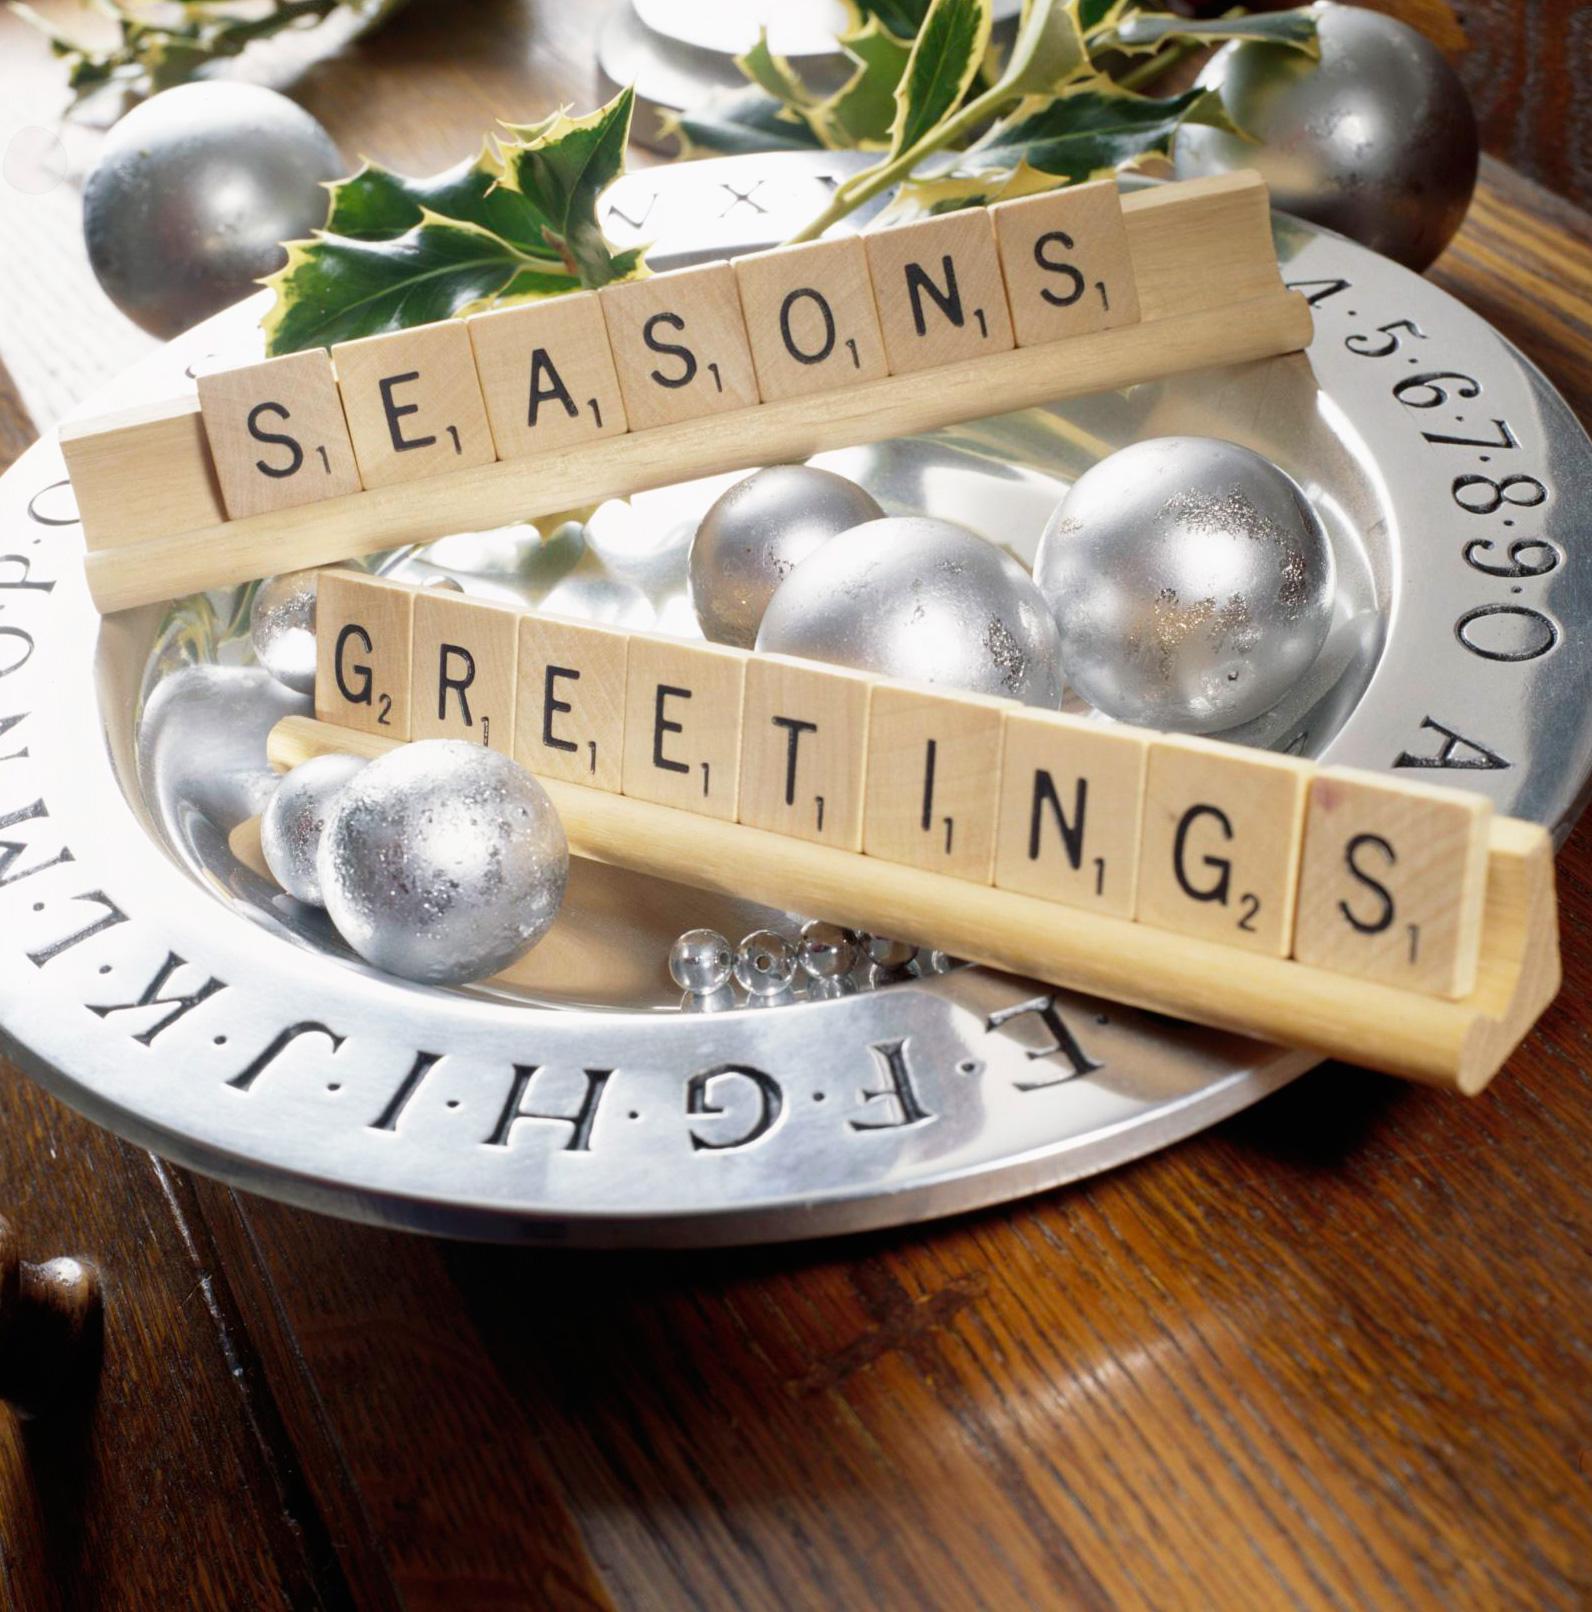 Christmas centerpiece ideas: scrabble